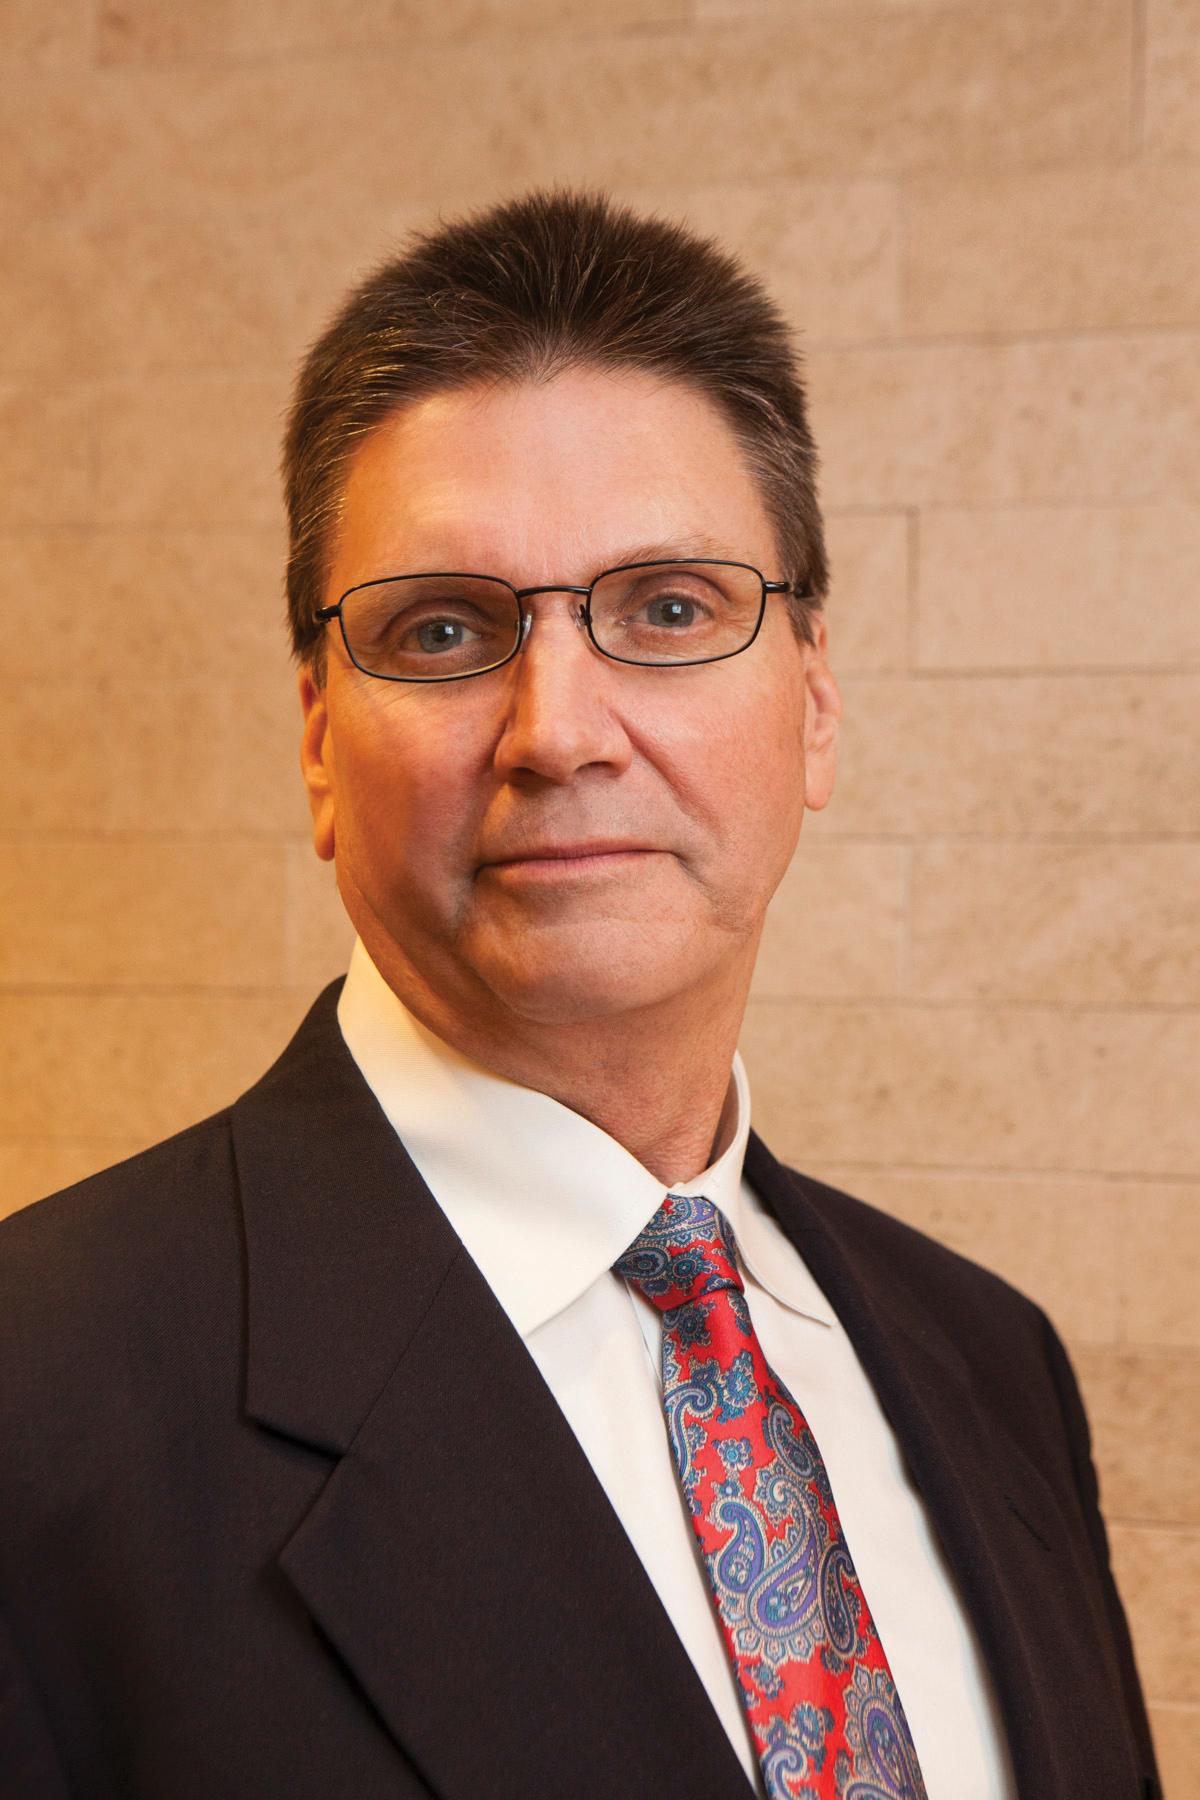 Michael Hoban